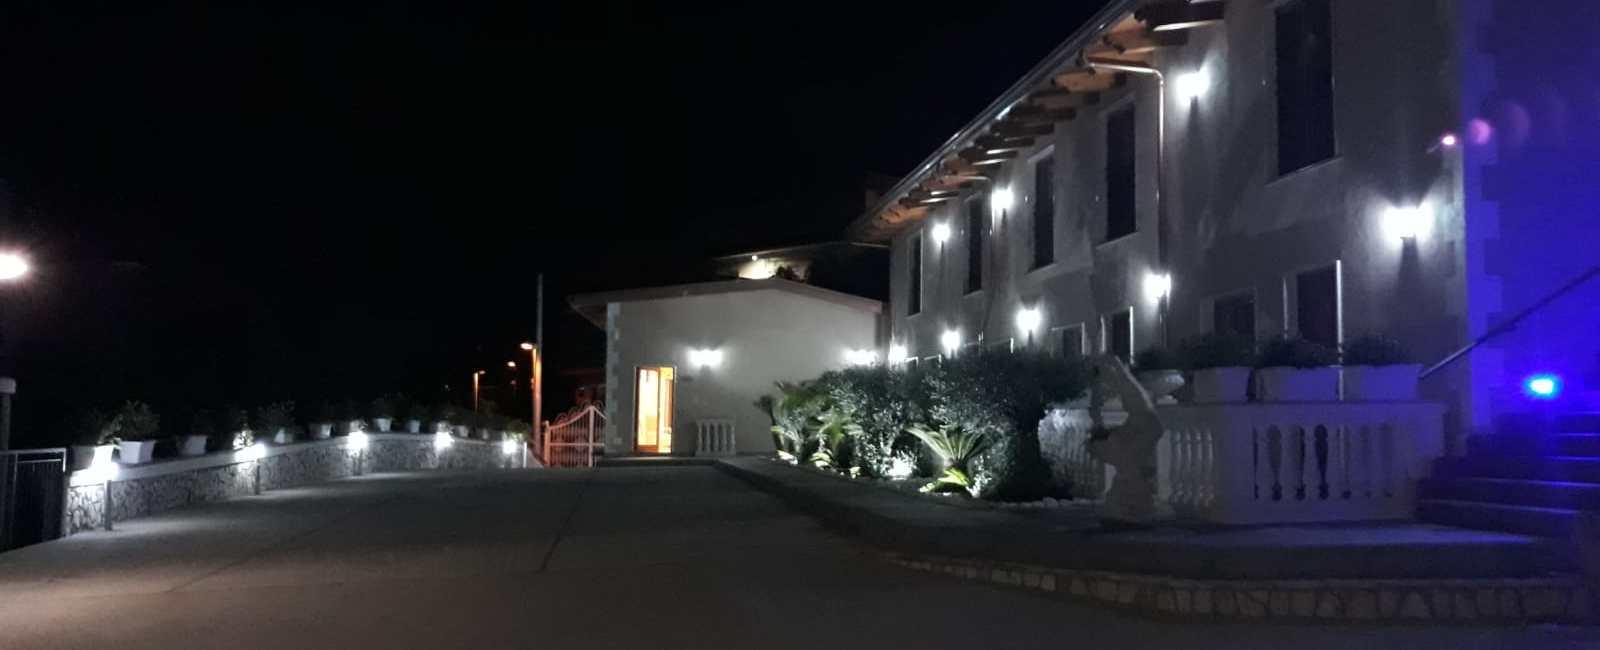 B&B Villa Catiè - La Galleria Fotografica